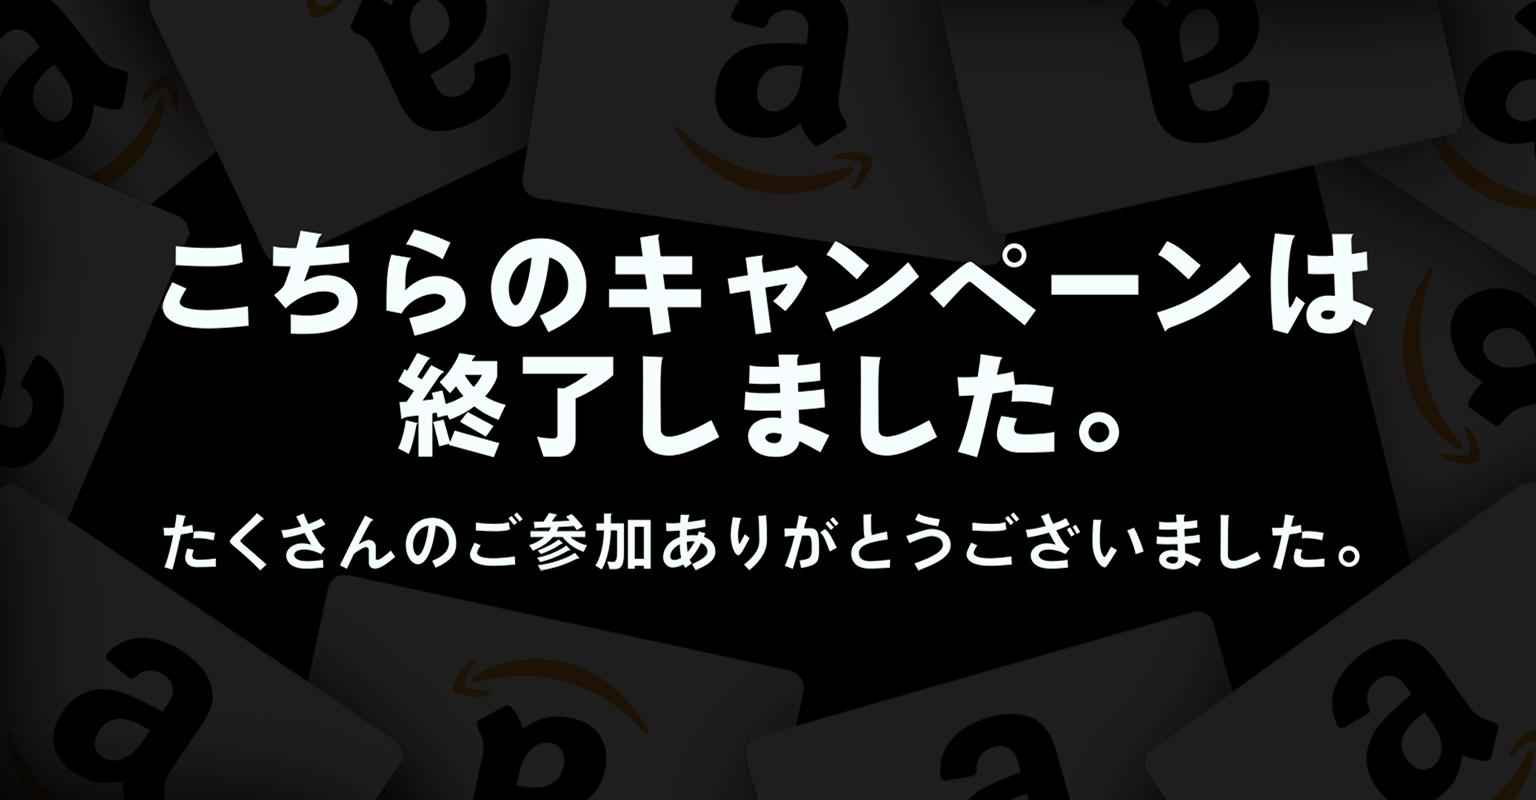 Amazonギフト券1000円分が毎日3名様に当たる! 🐤公式ツイッター登録&RTキャンペーン❣